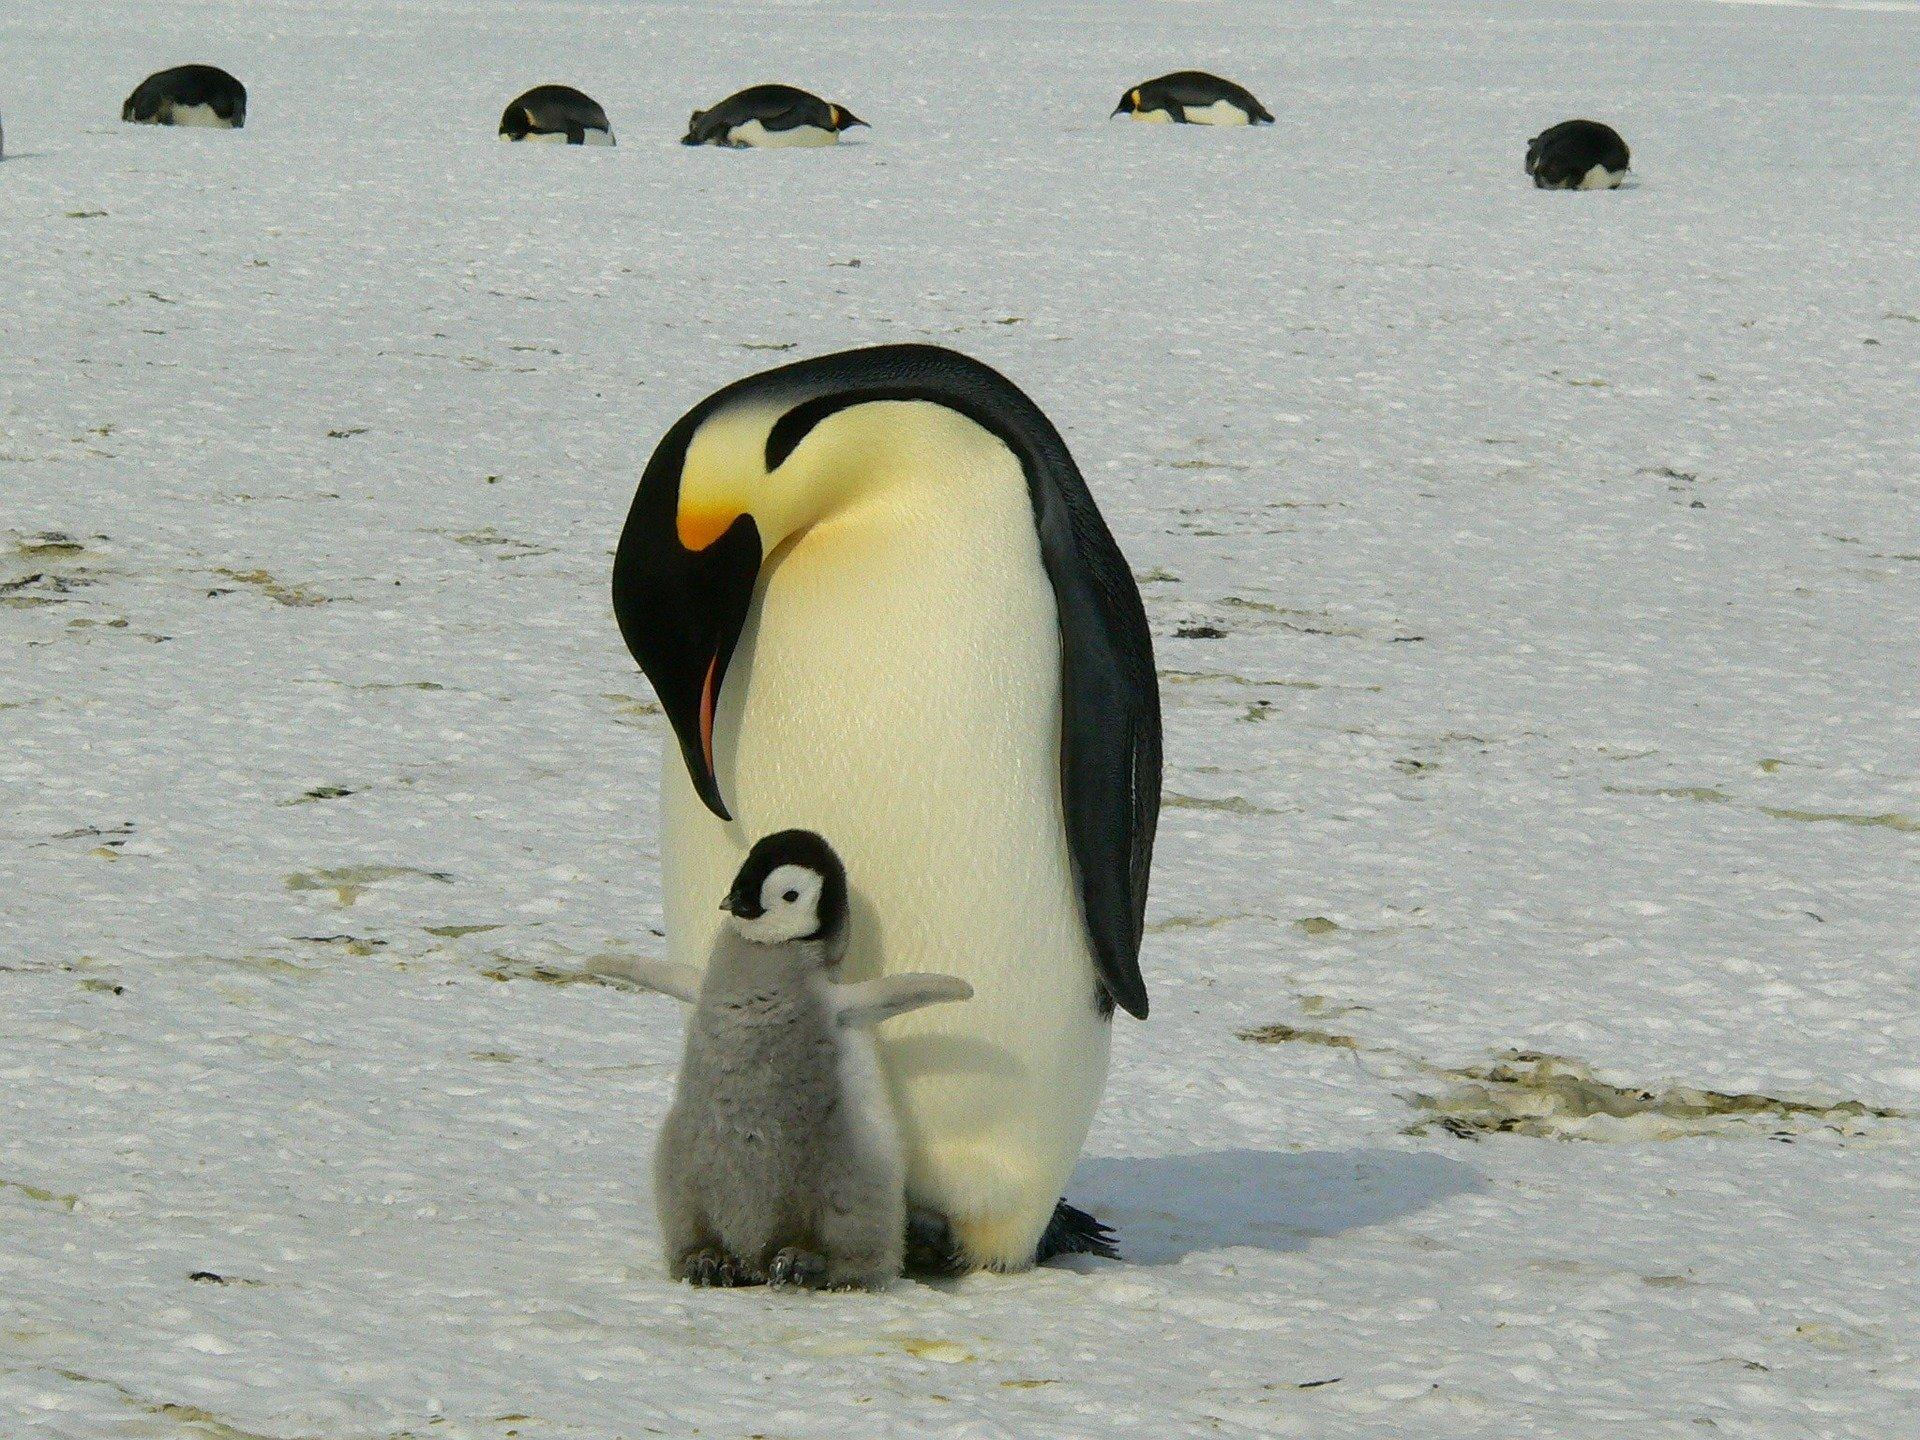 penguins-429134_1920